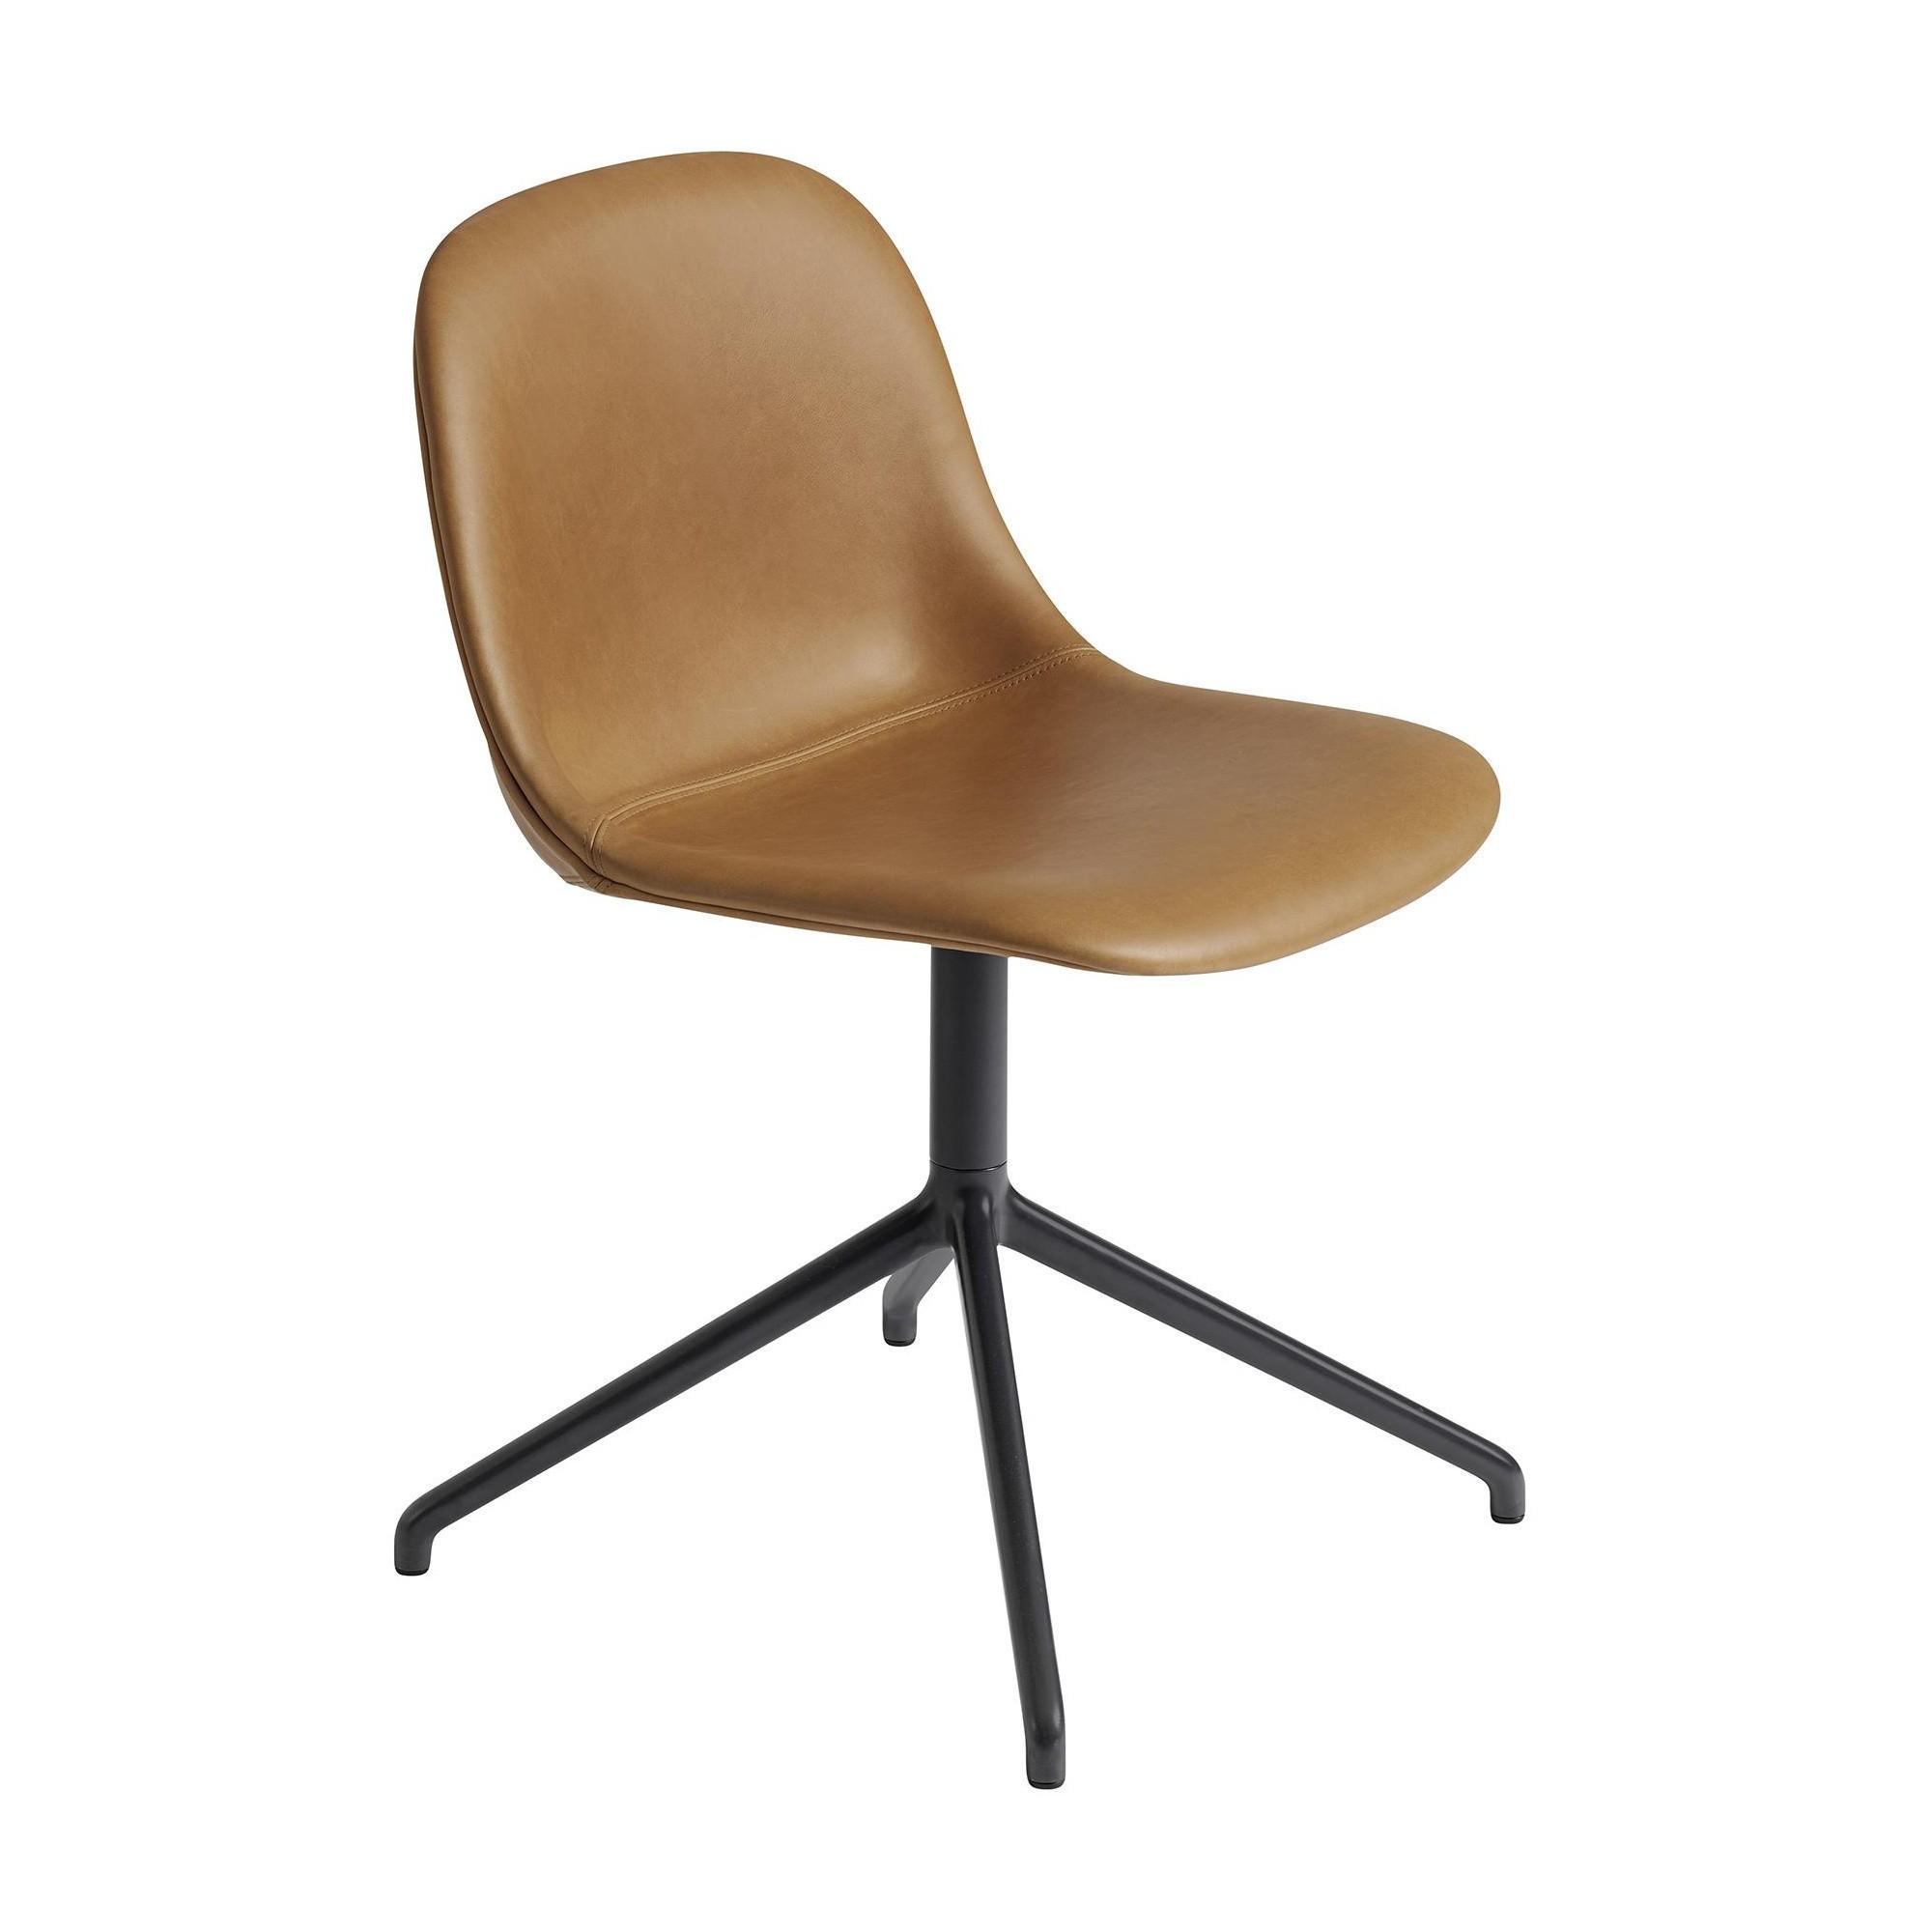 Outstanding Fiber Side Chair Swivel Base Upholstered Beatyapartments Chair Design Images Beatyapartmentscom